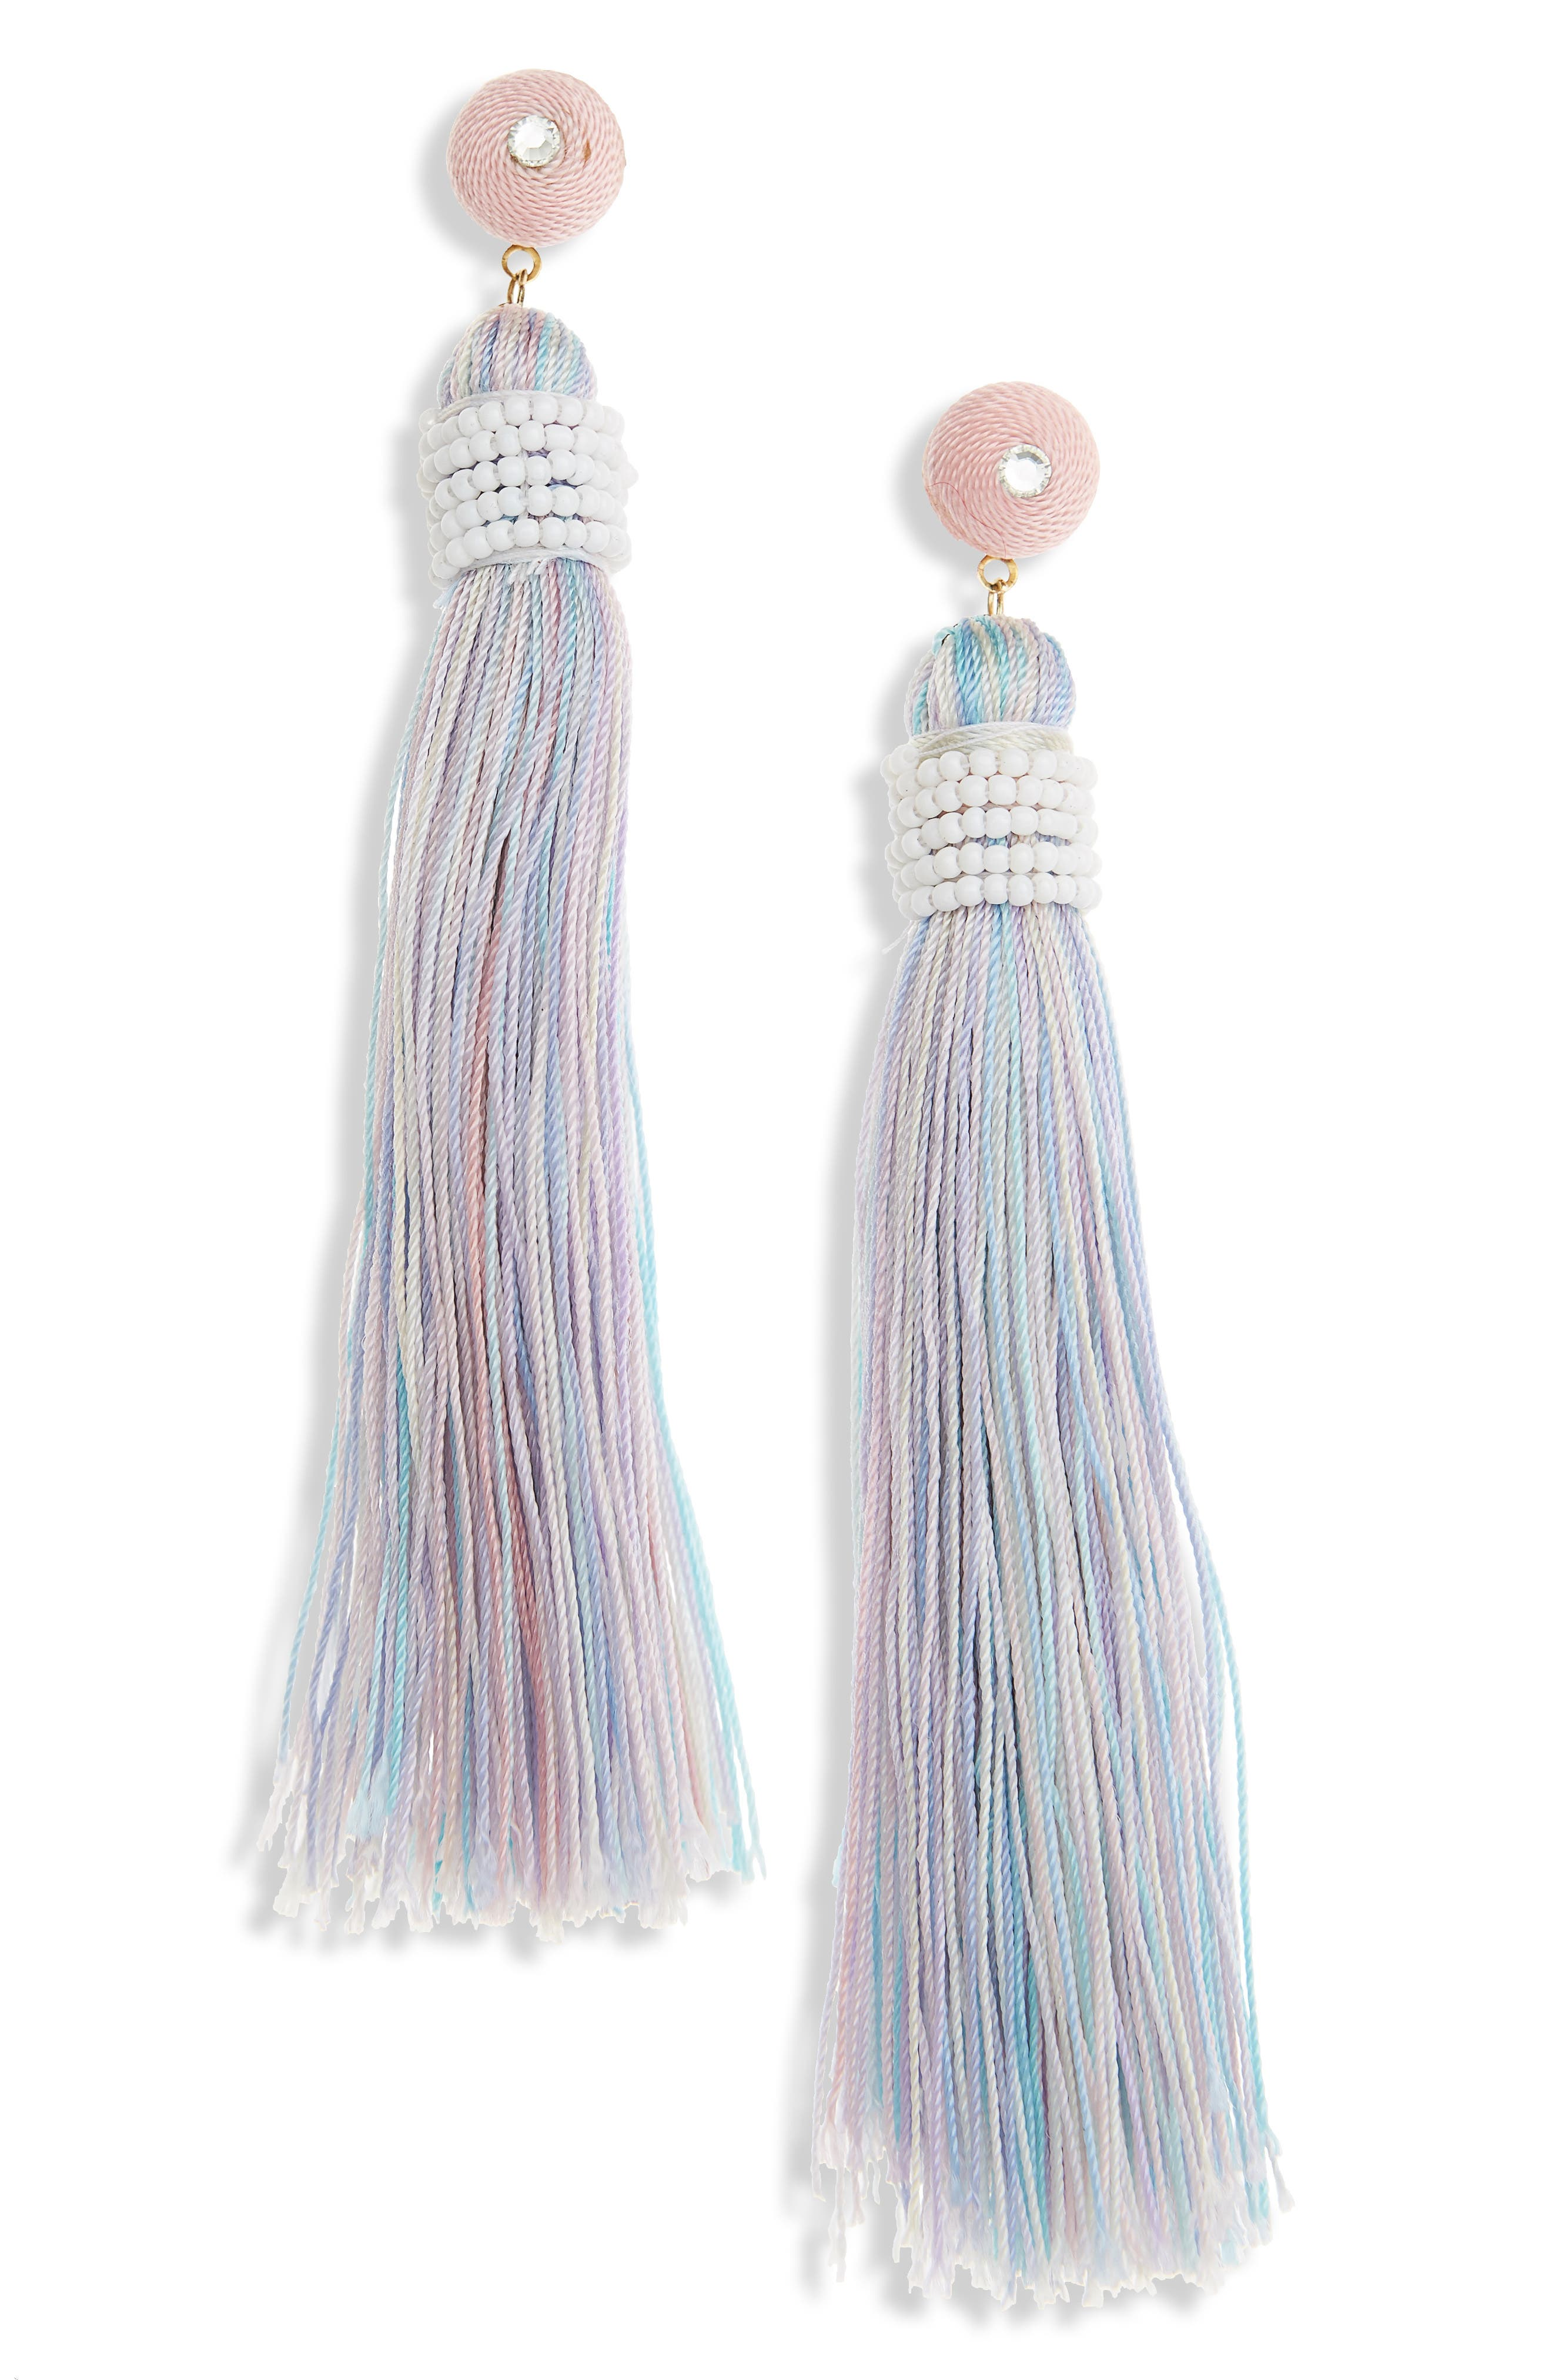 Beaded Wrap Tassel Earrings,                         Main,                         color, Multi